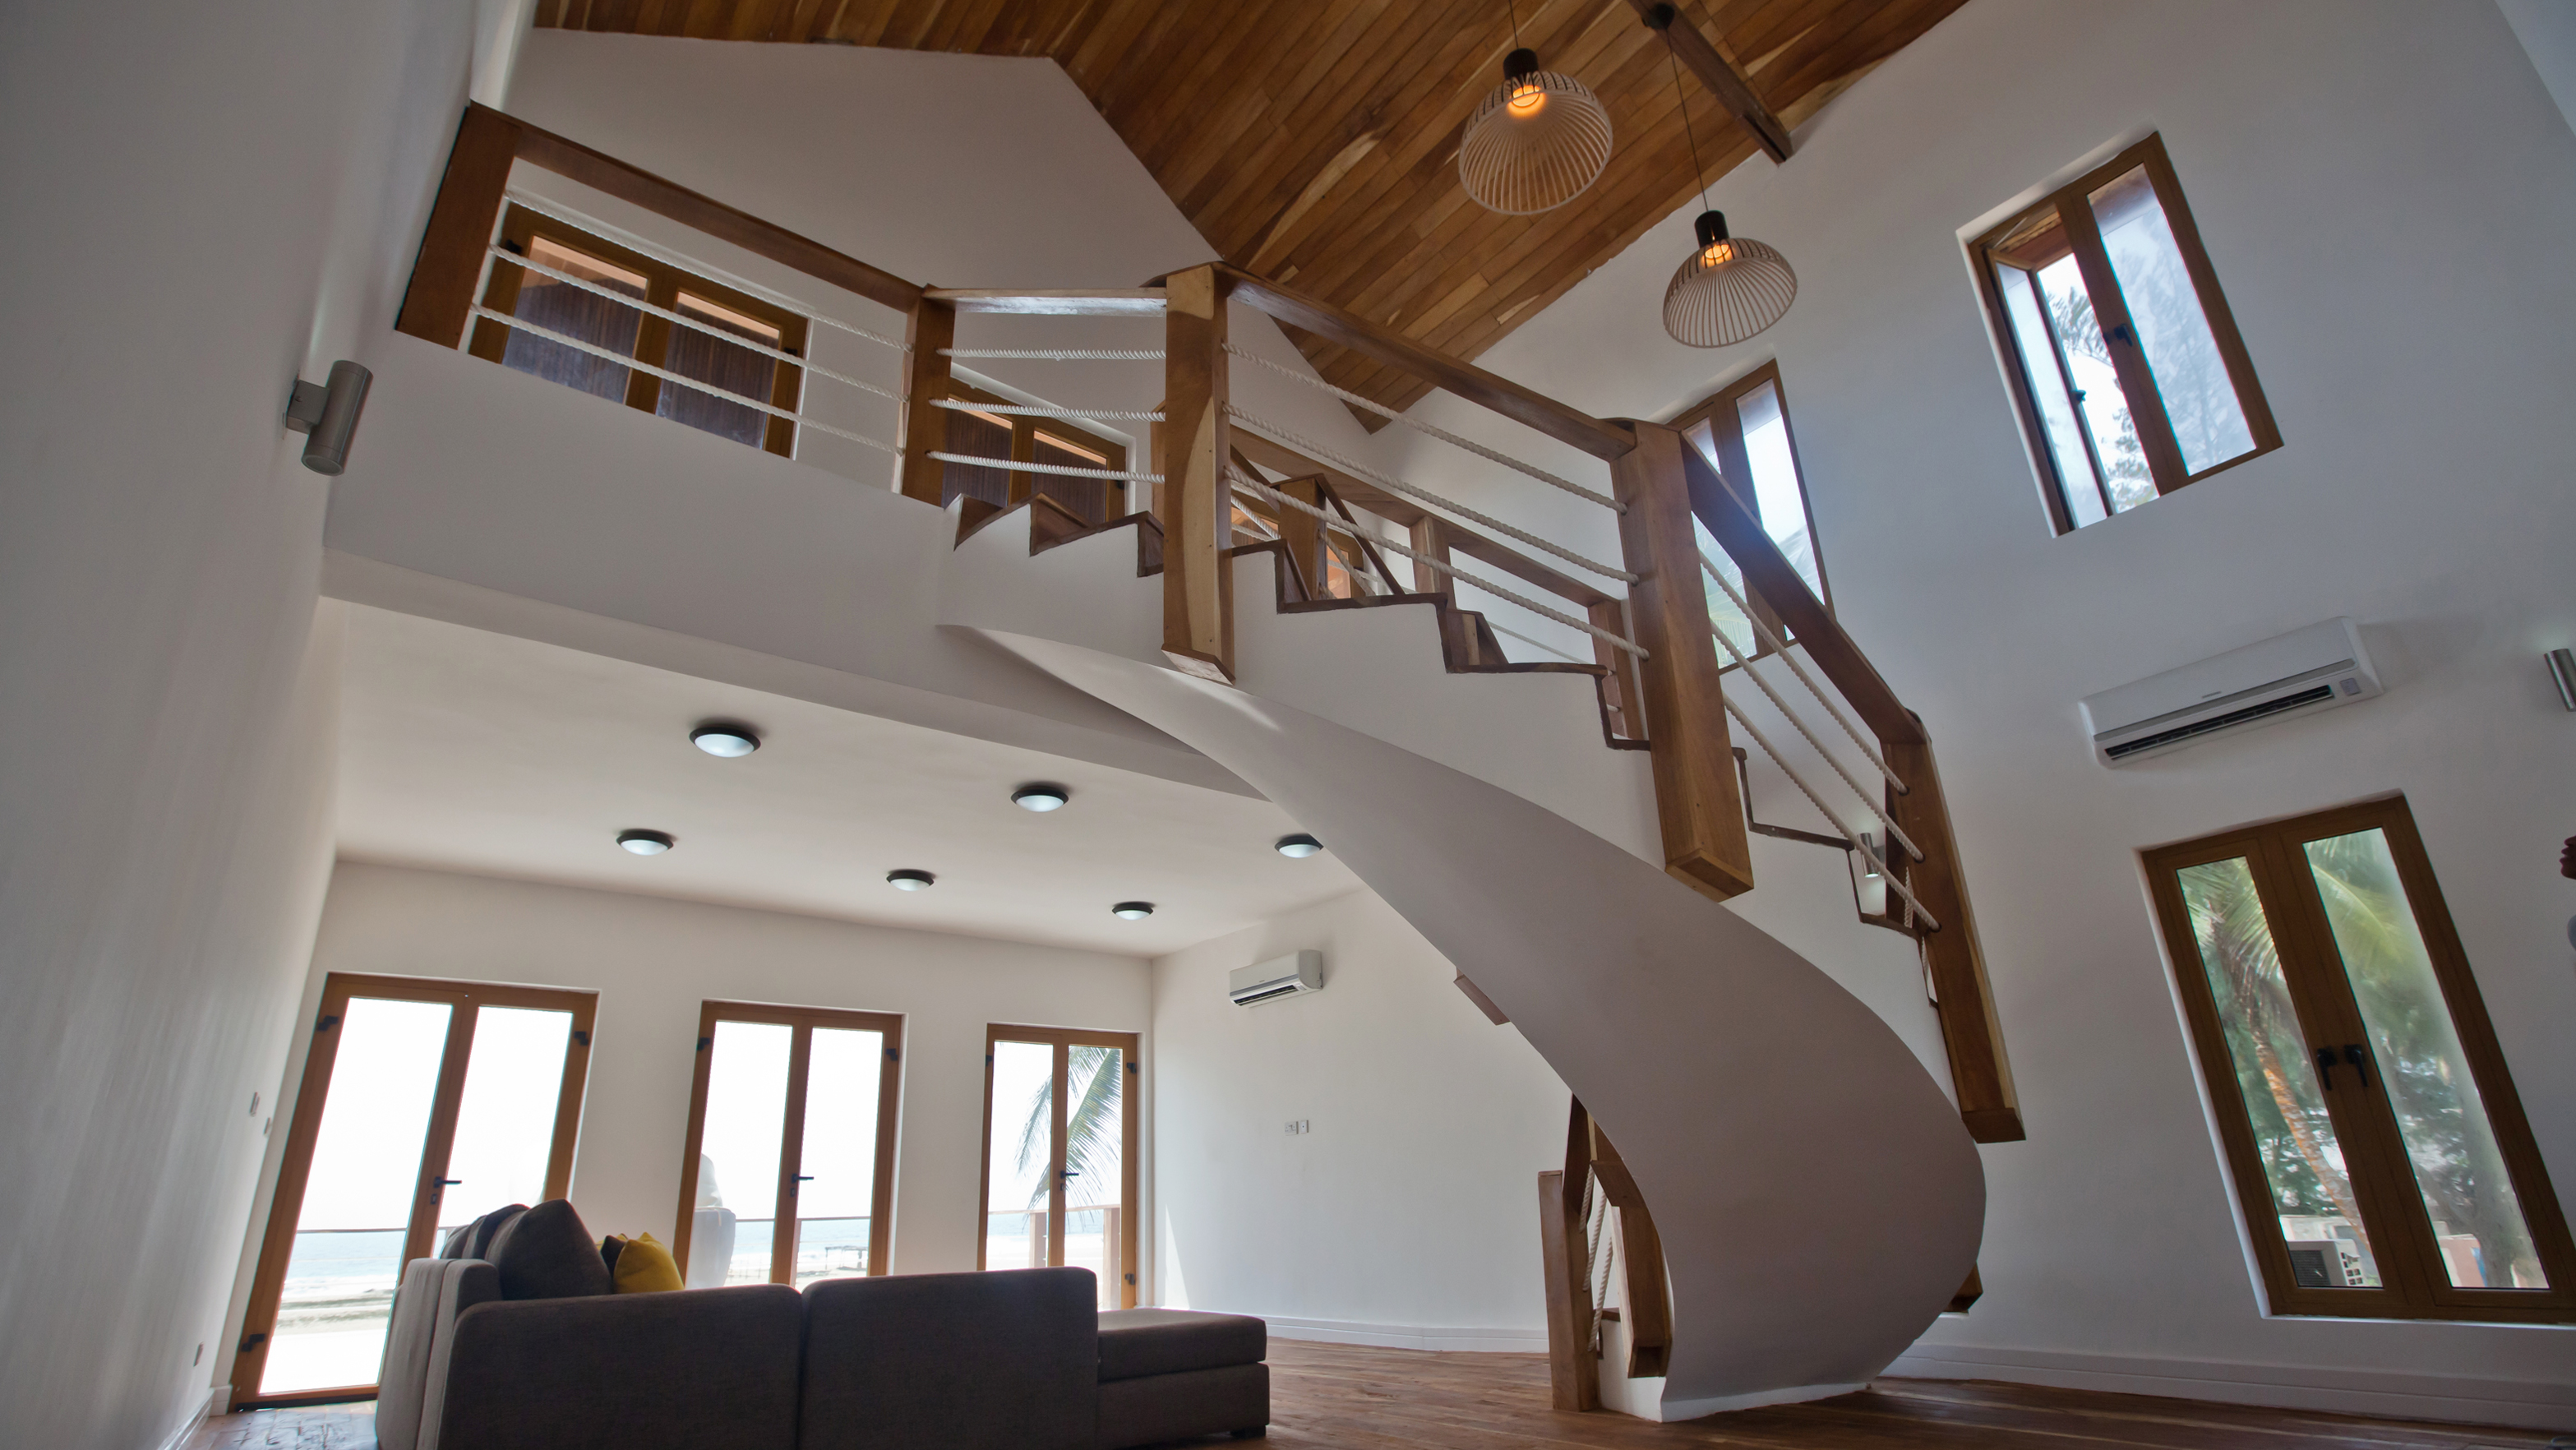 PRIVATE BEACH HOUSE INTERIOR 1